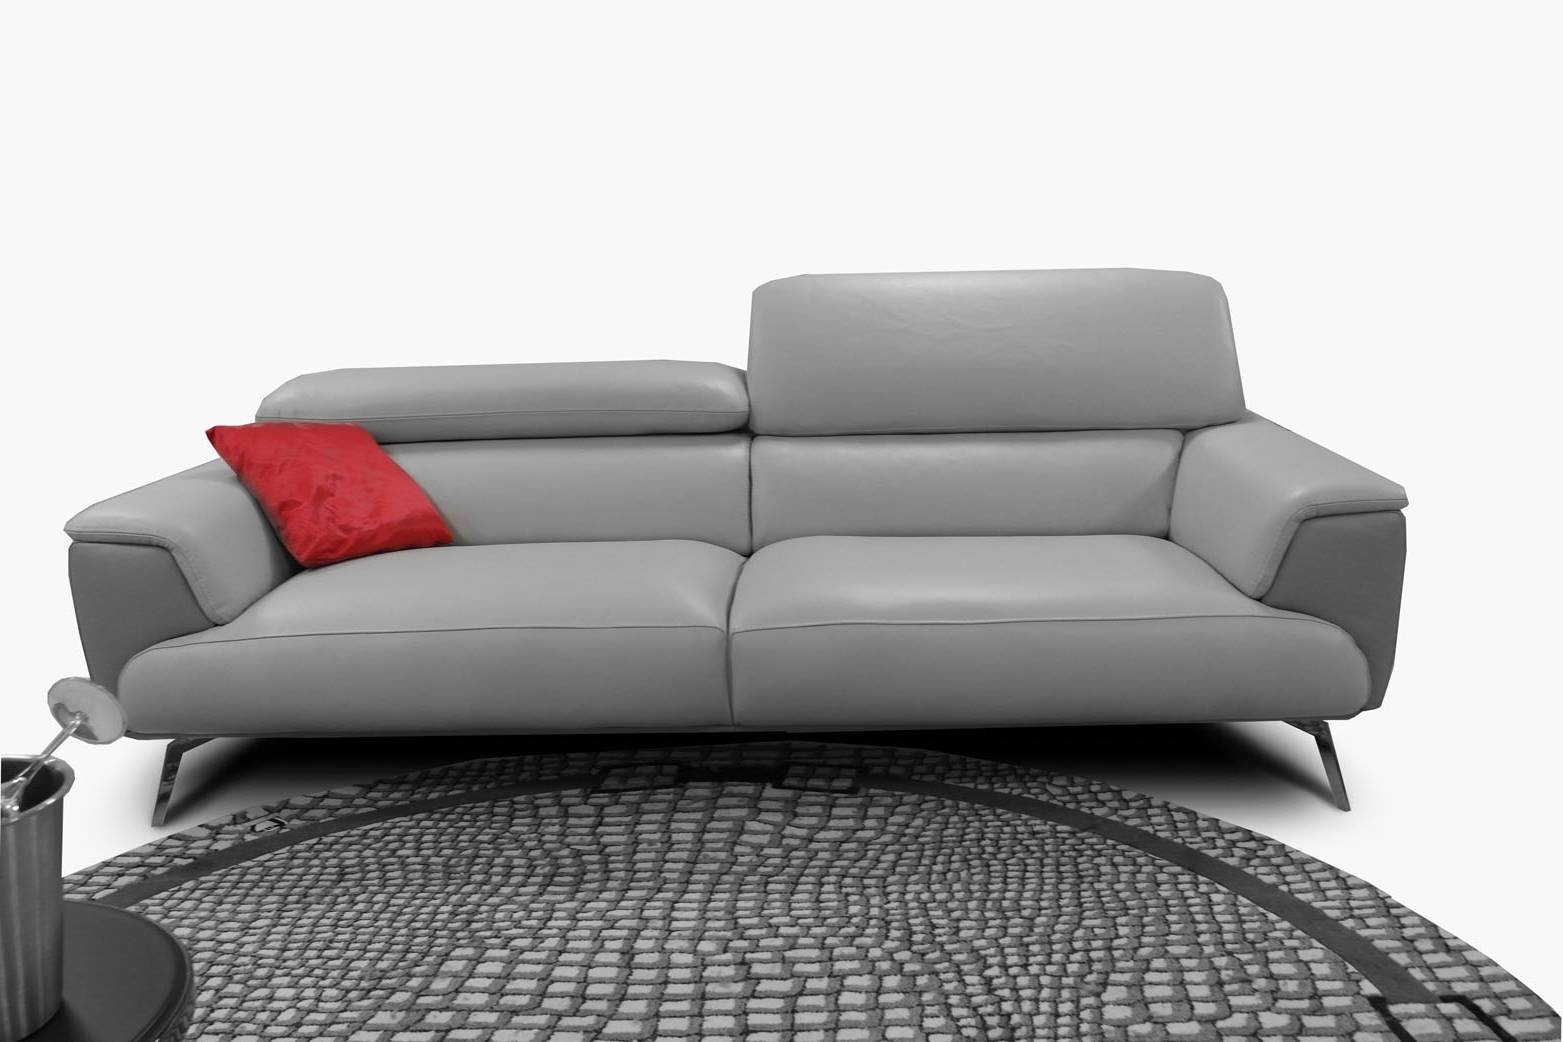 Preferred Round & Unusual Sofas • Nieribarcelona Throughout Unusual Sofas (View 6 of 15)